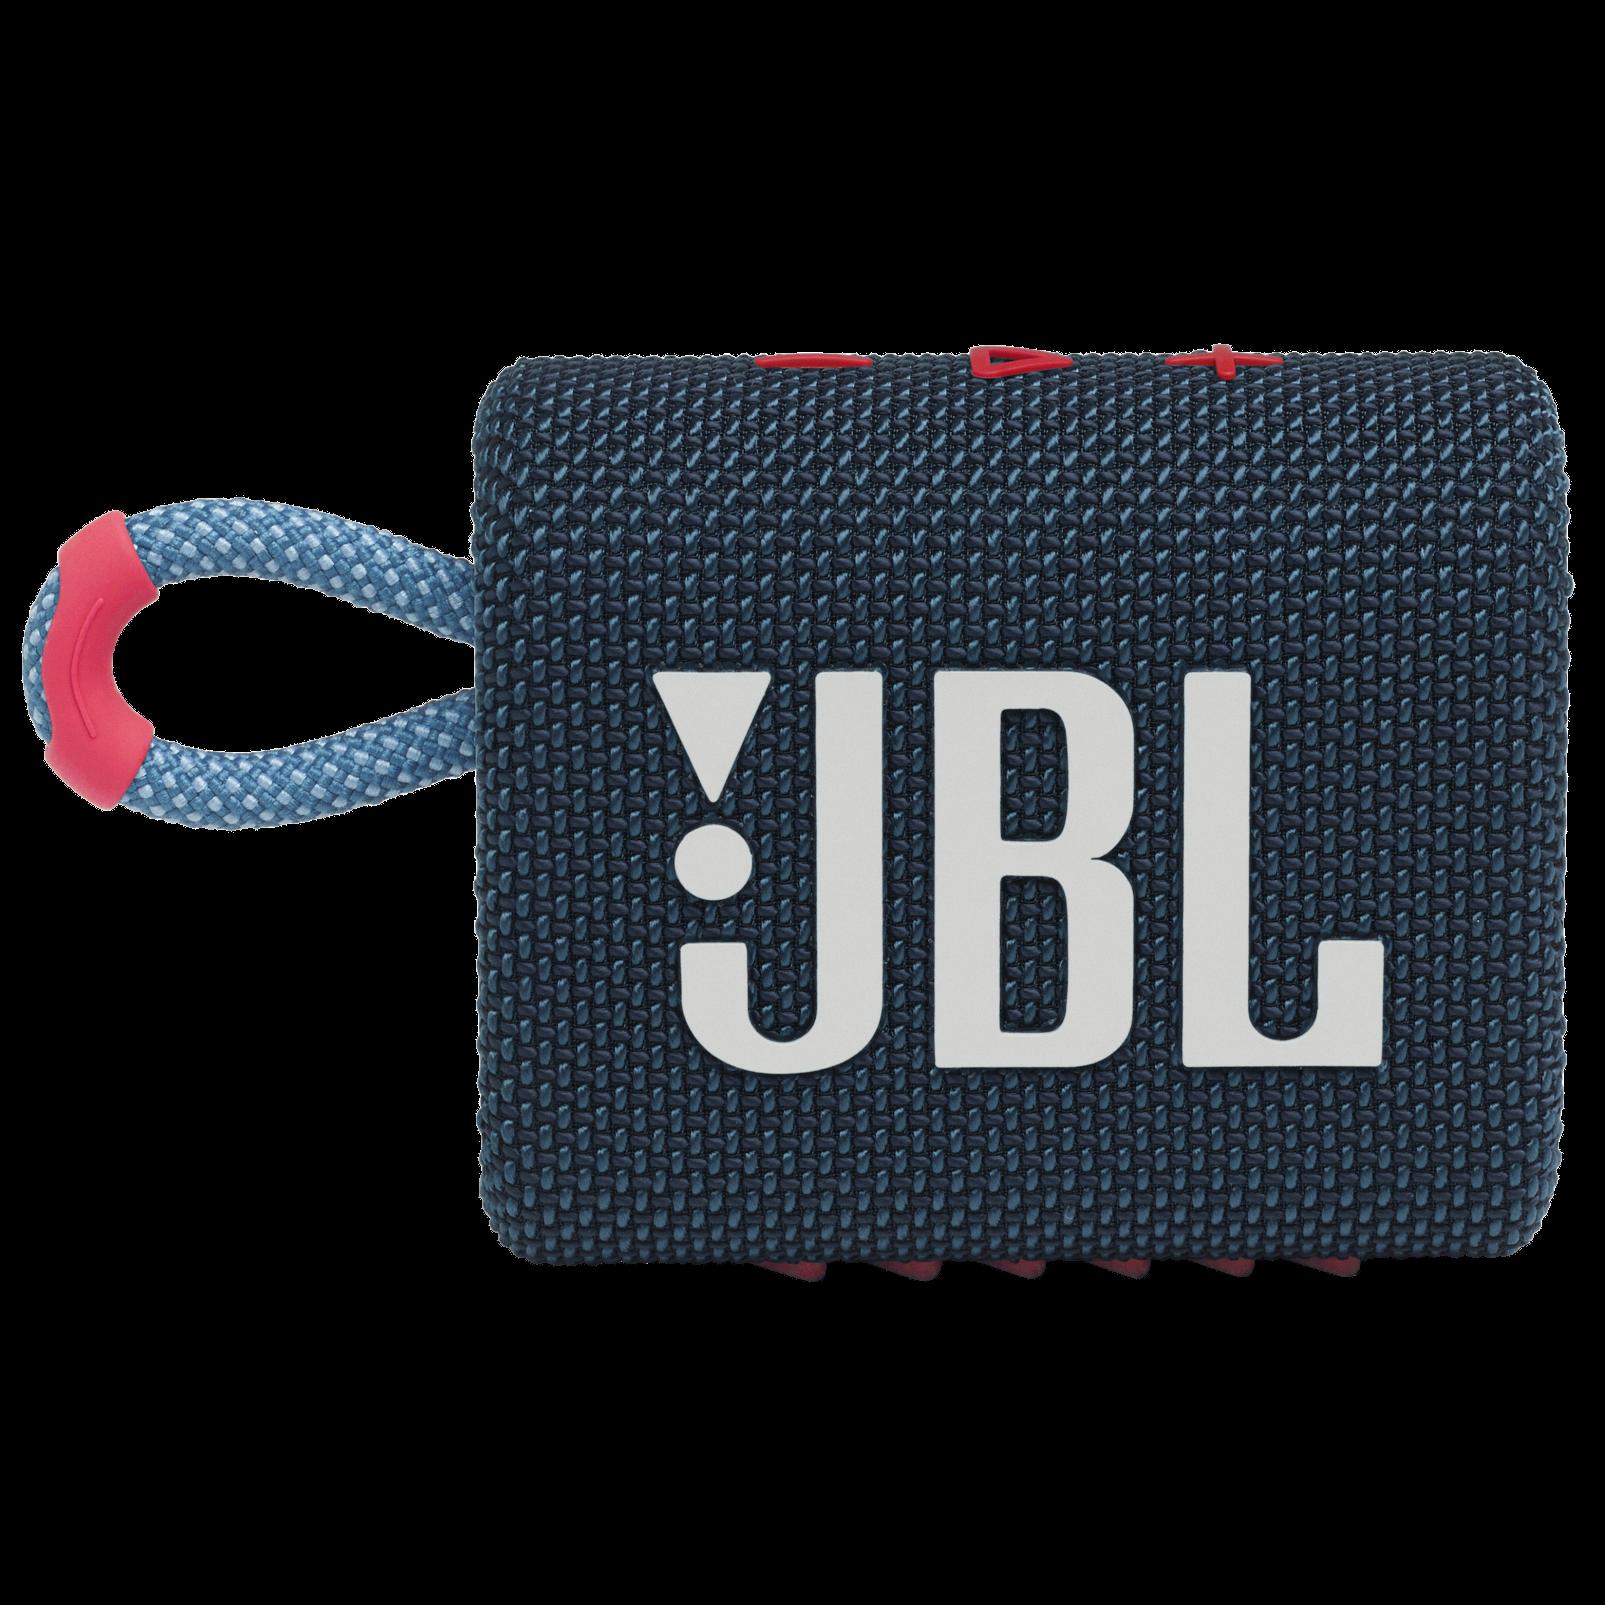 JBL Go 3 - Blue / Pink - Portable Waterproof Speaker - Front